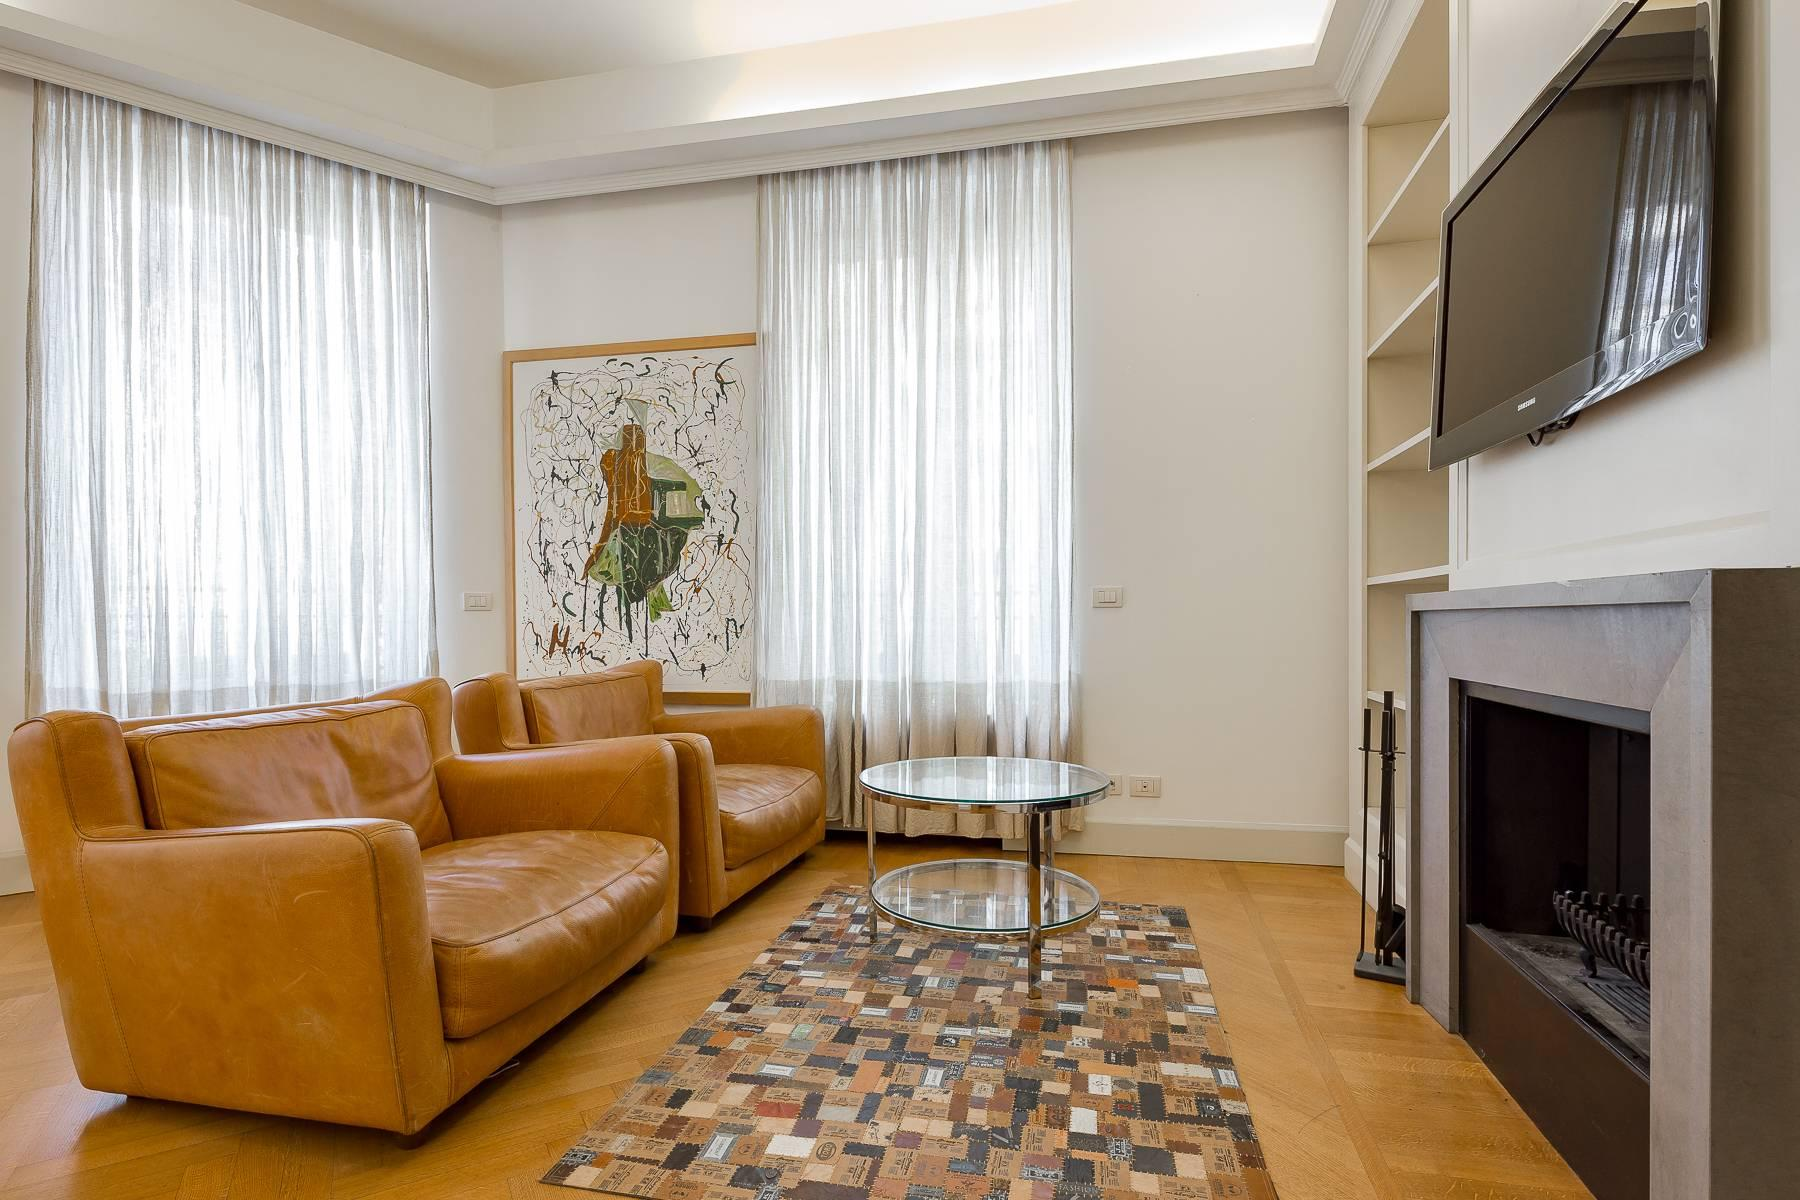 Prestigious penthouse in Piazza Mondadori of 500 square meters - 30